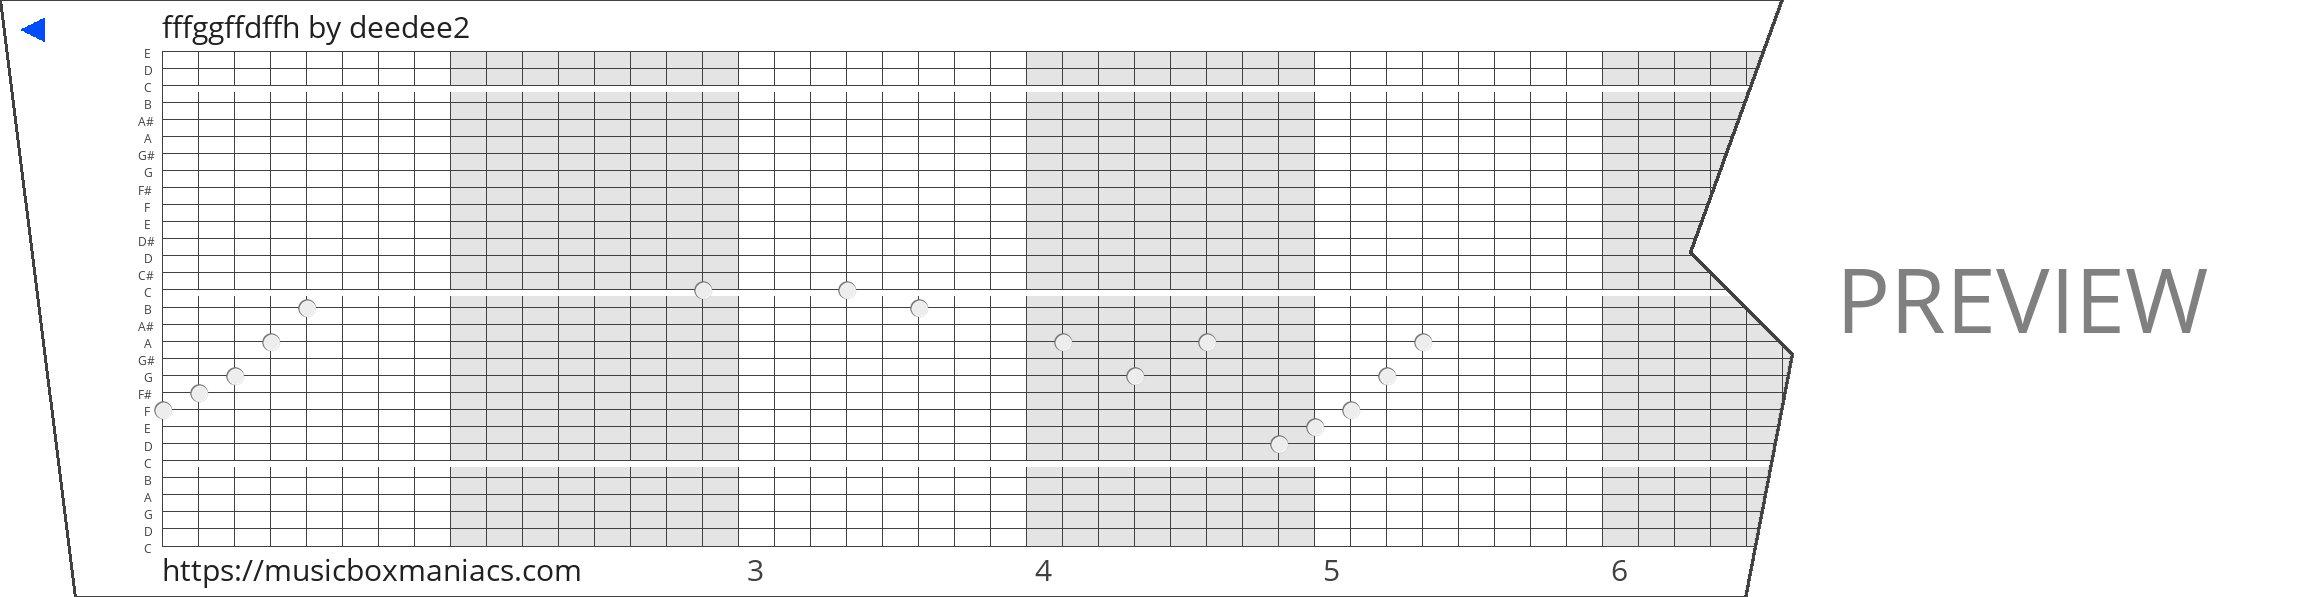 fffggffdffh 30 note music box paper strip